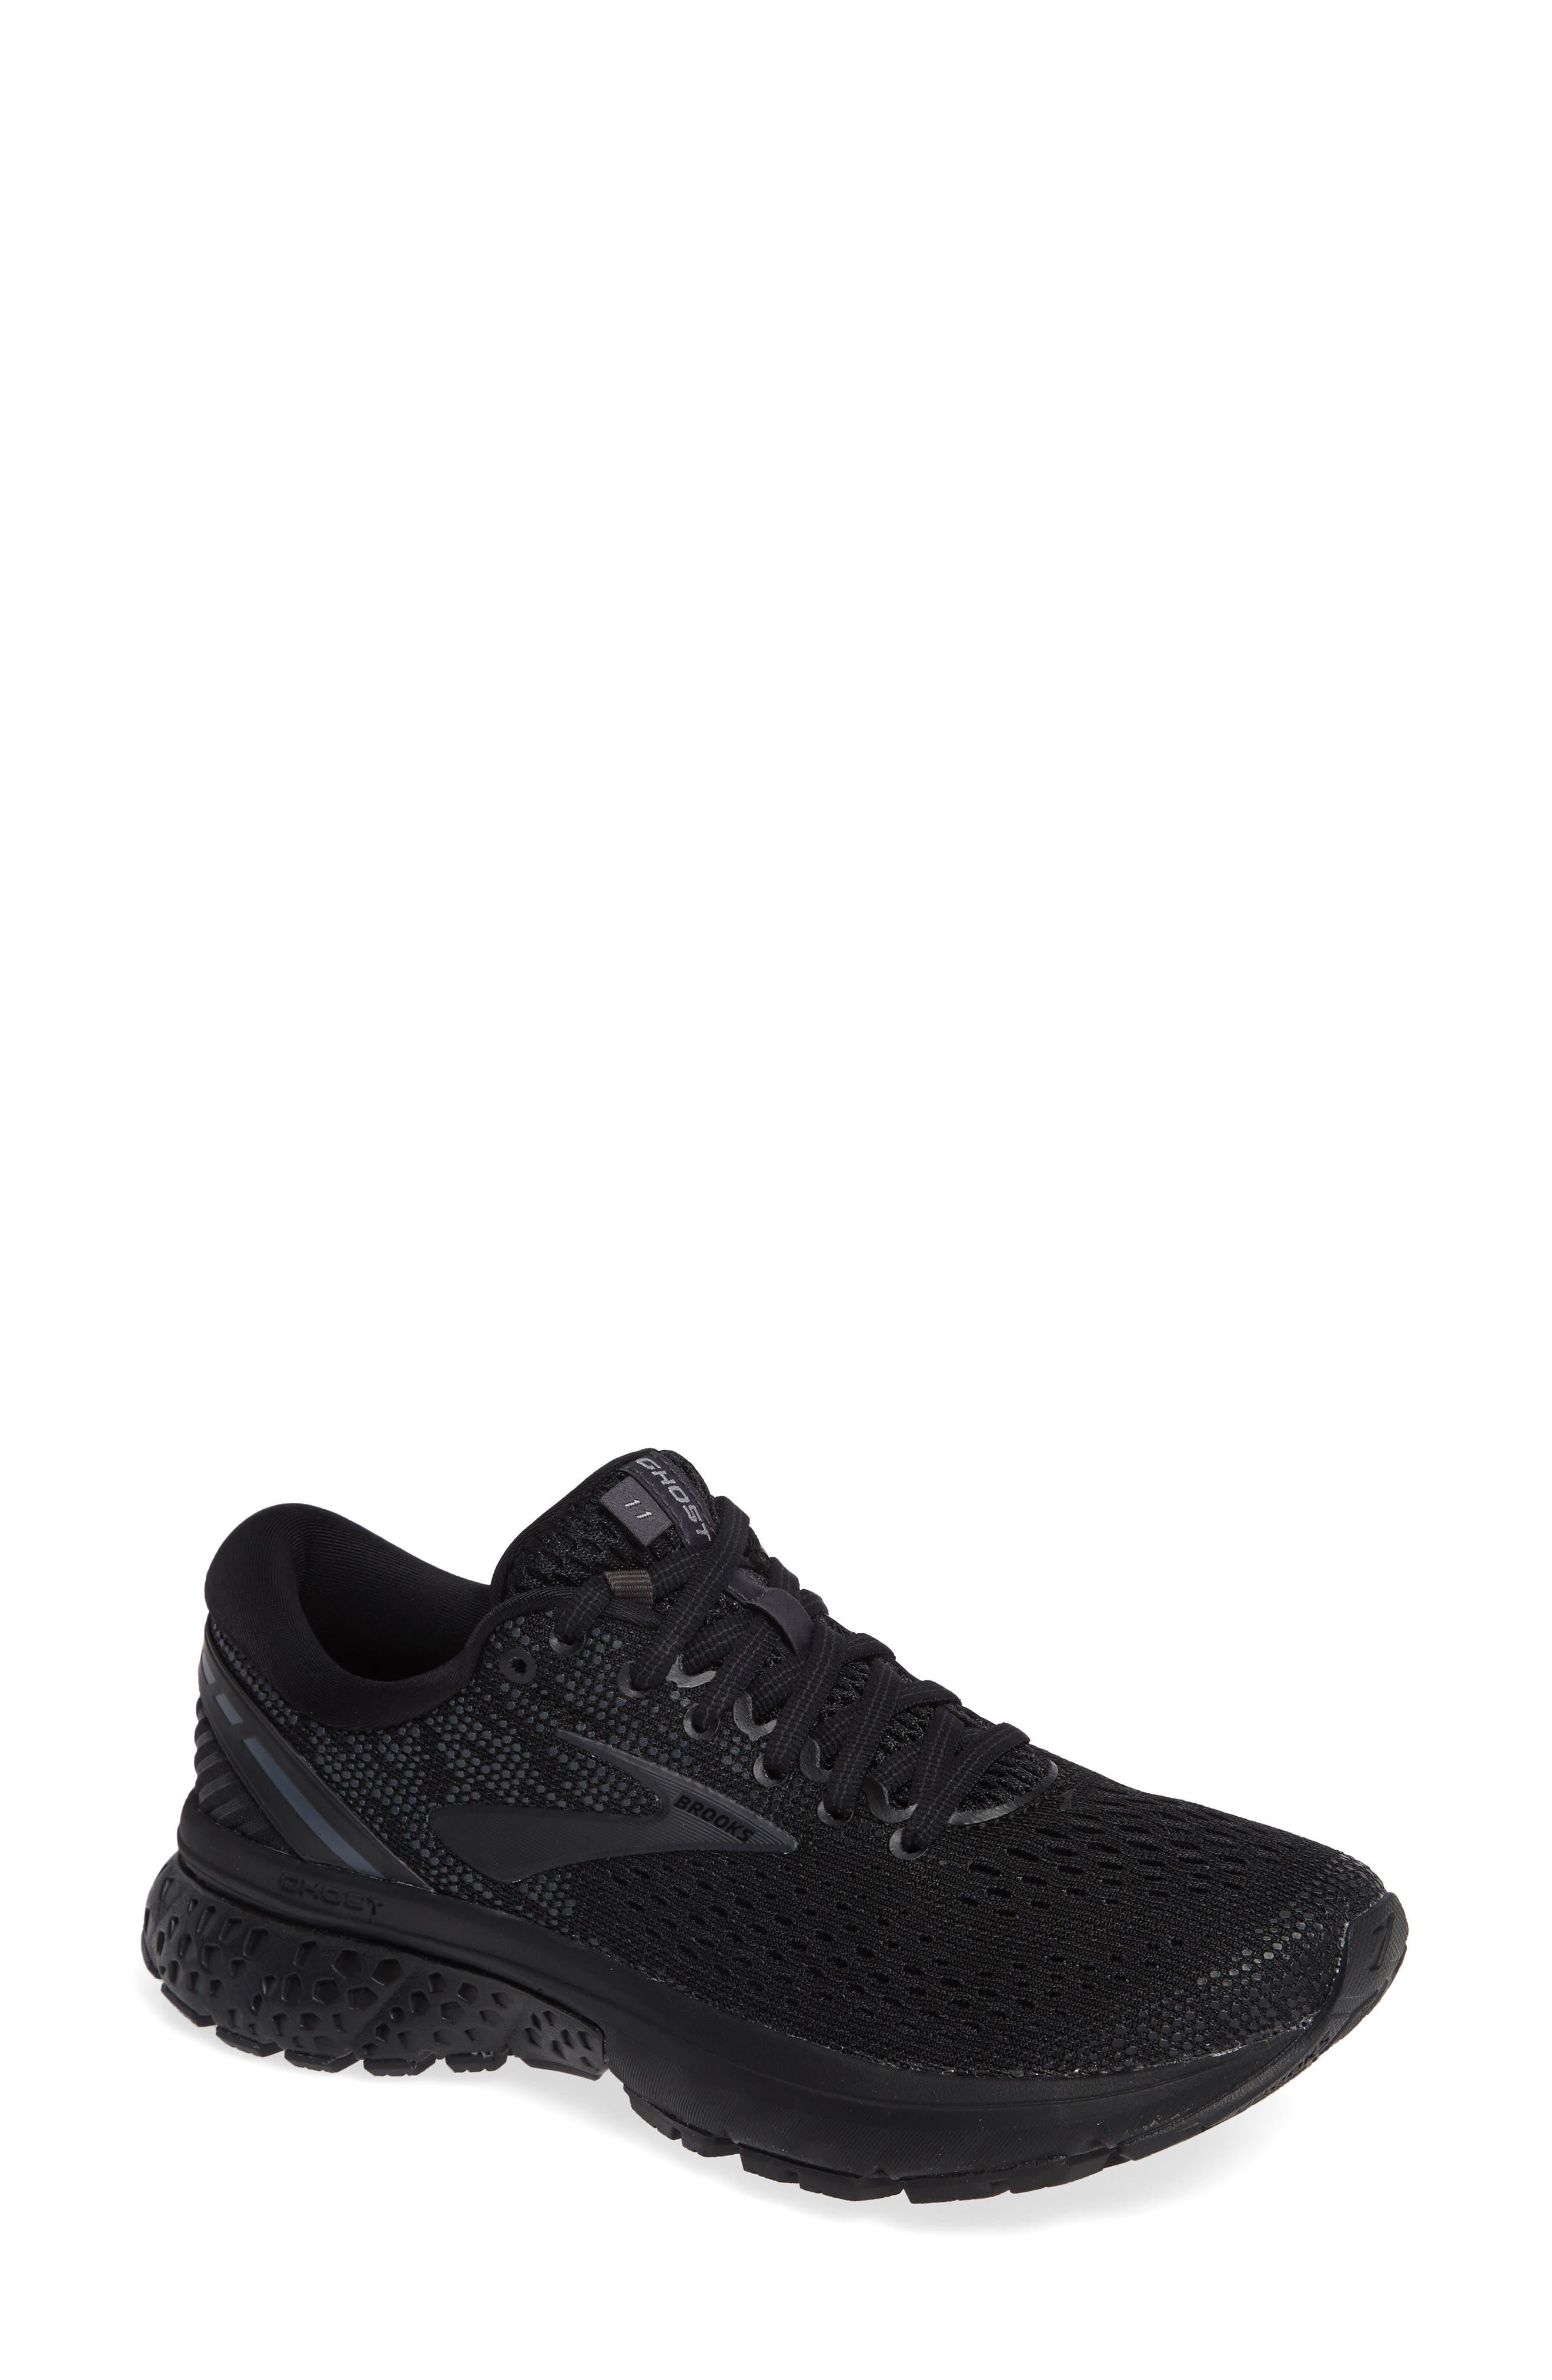 BROOKS Ghost 11 Running Shoe, Main, color, BLACK/ EBONY